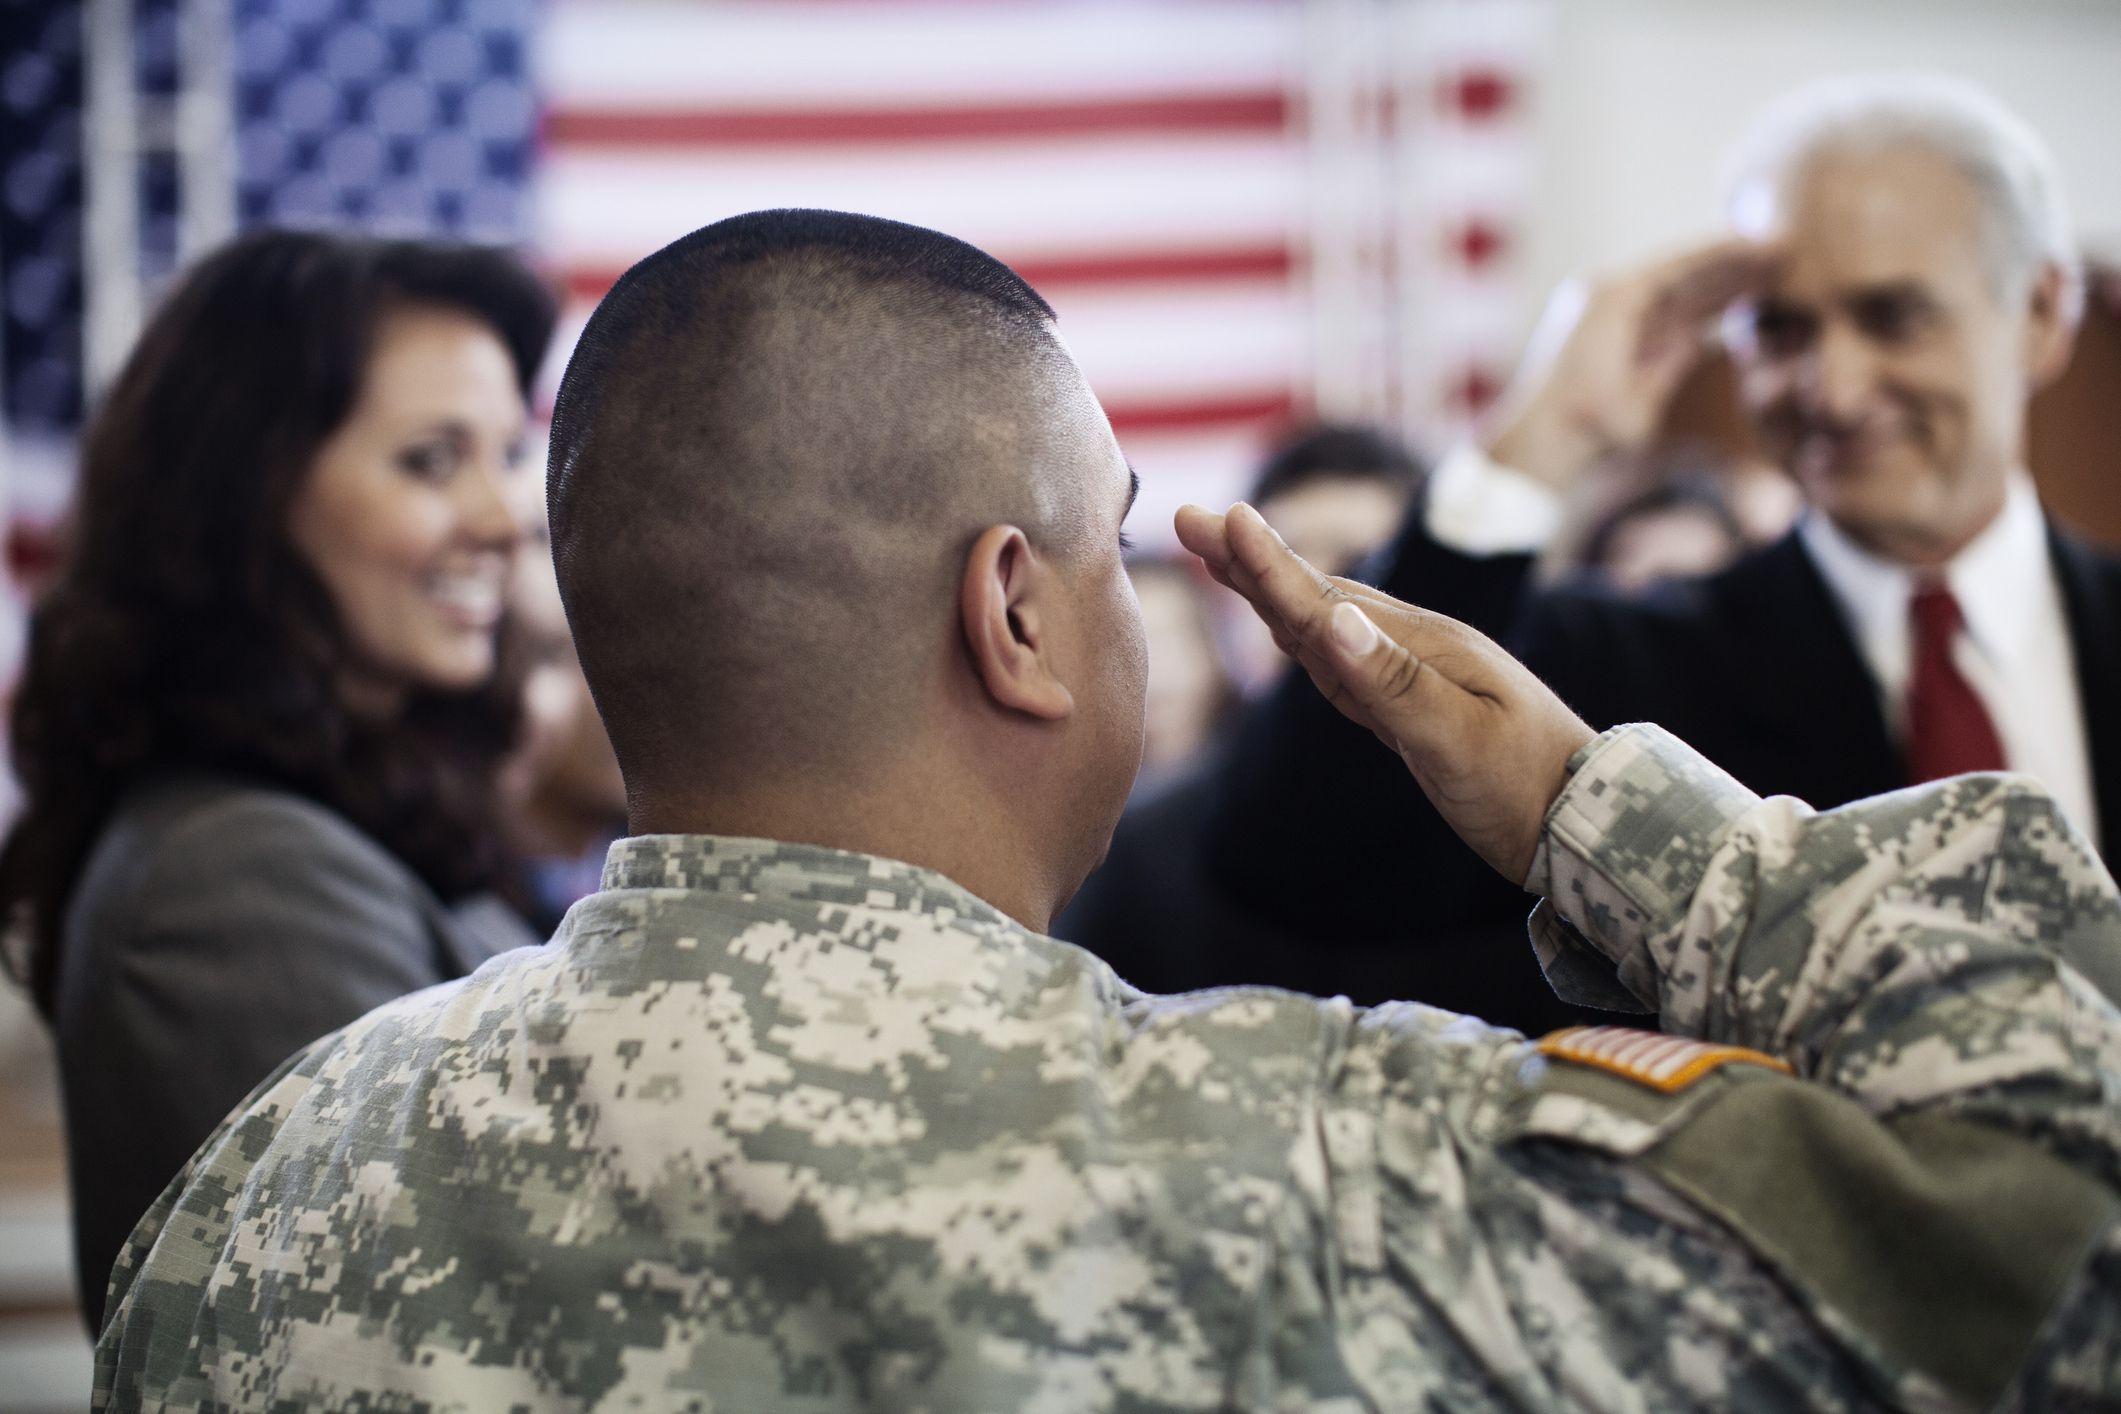 Marine Corps Haircut And Facial Hair Standards